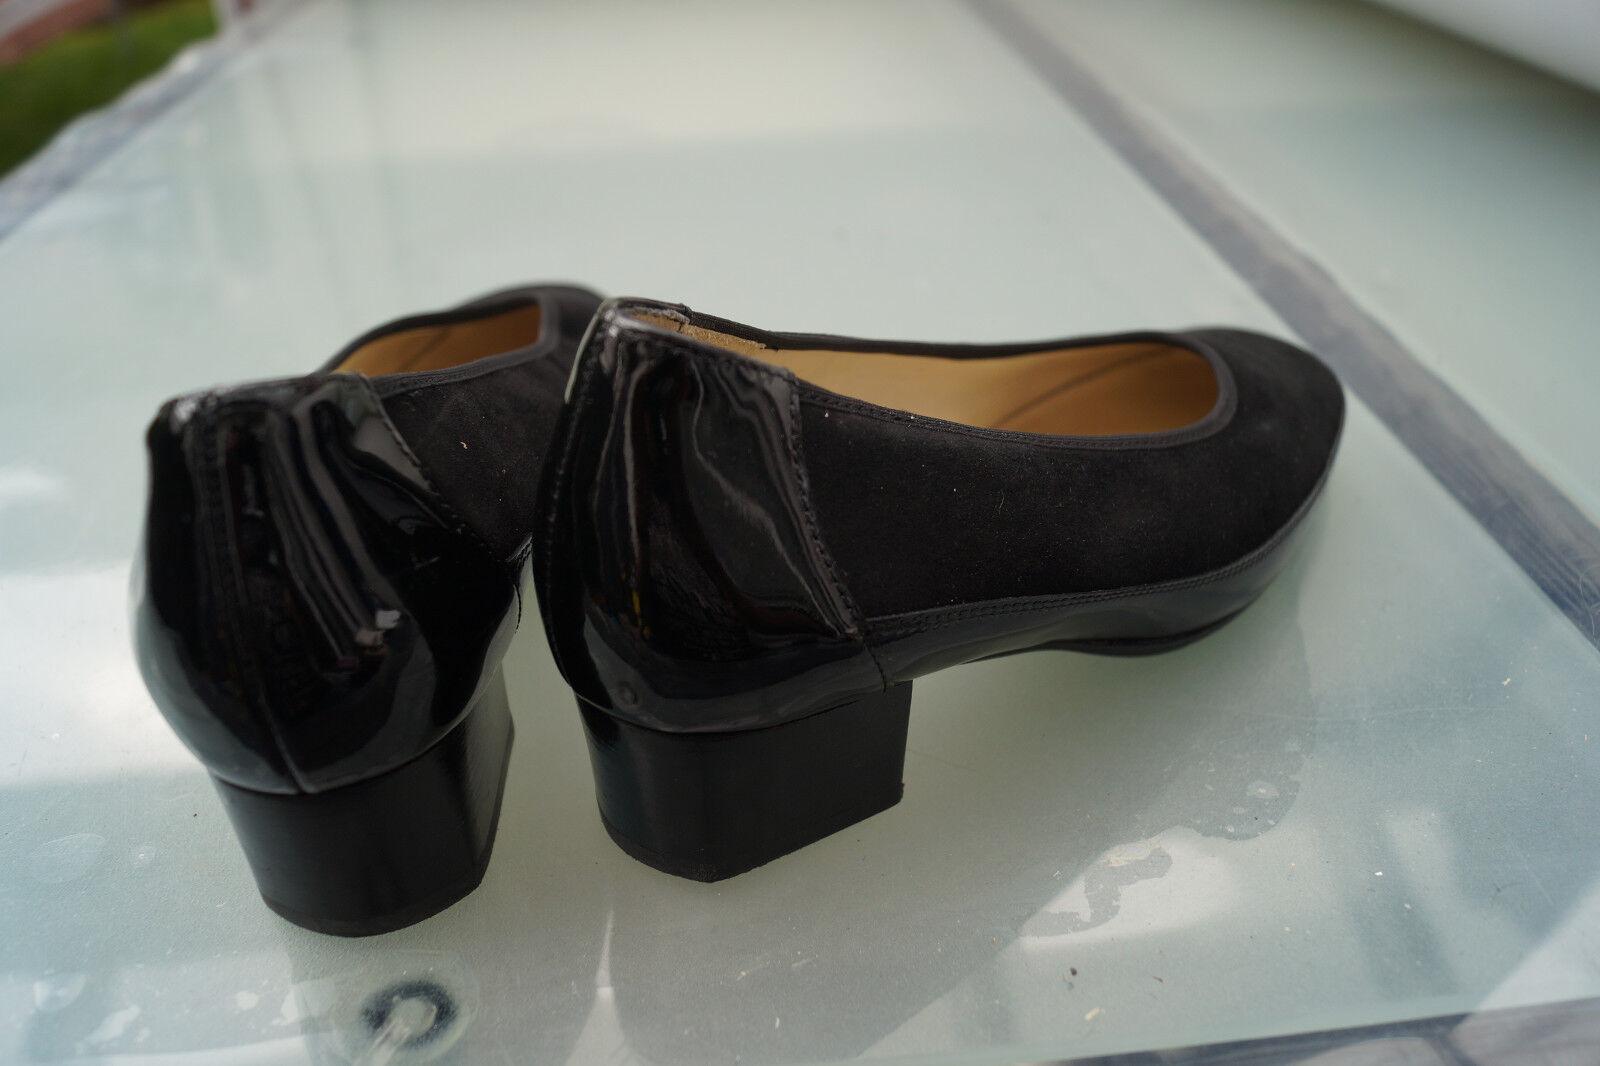 Hassia evelyn Damen Damen Damen Comfort Schuhe Pumps Einlagen Gr.3,5 / 36 schwarz Leder #52 a2e113